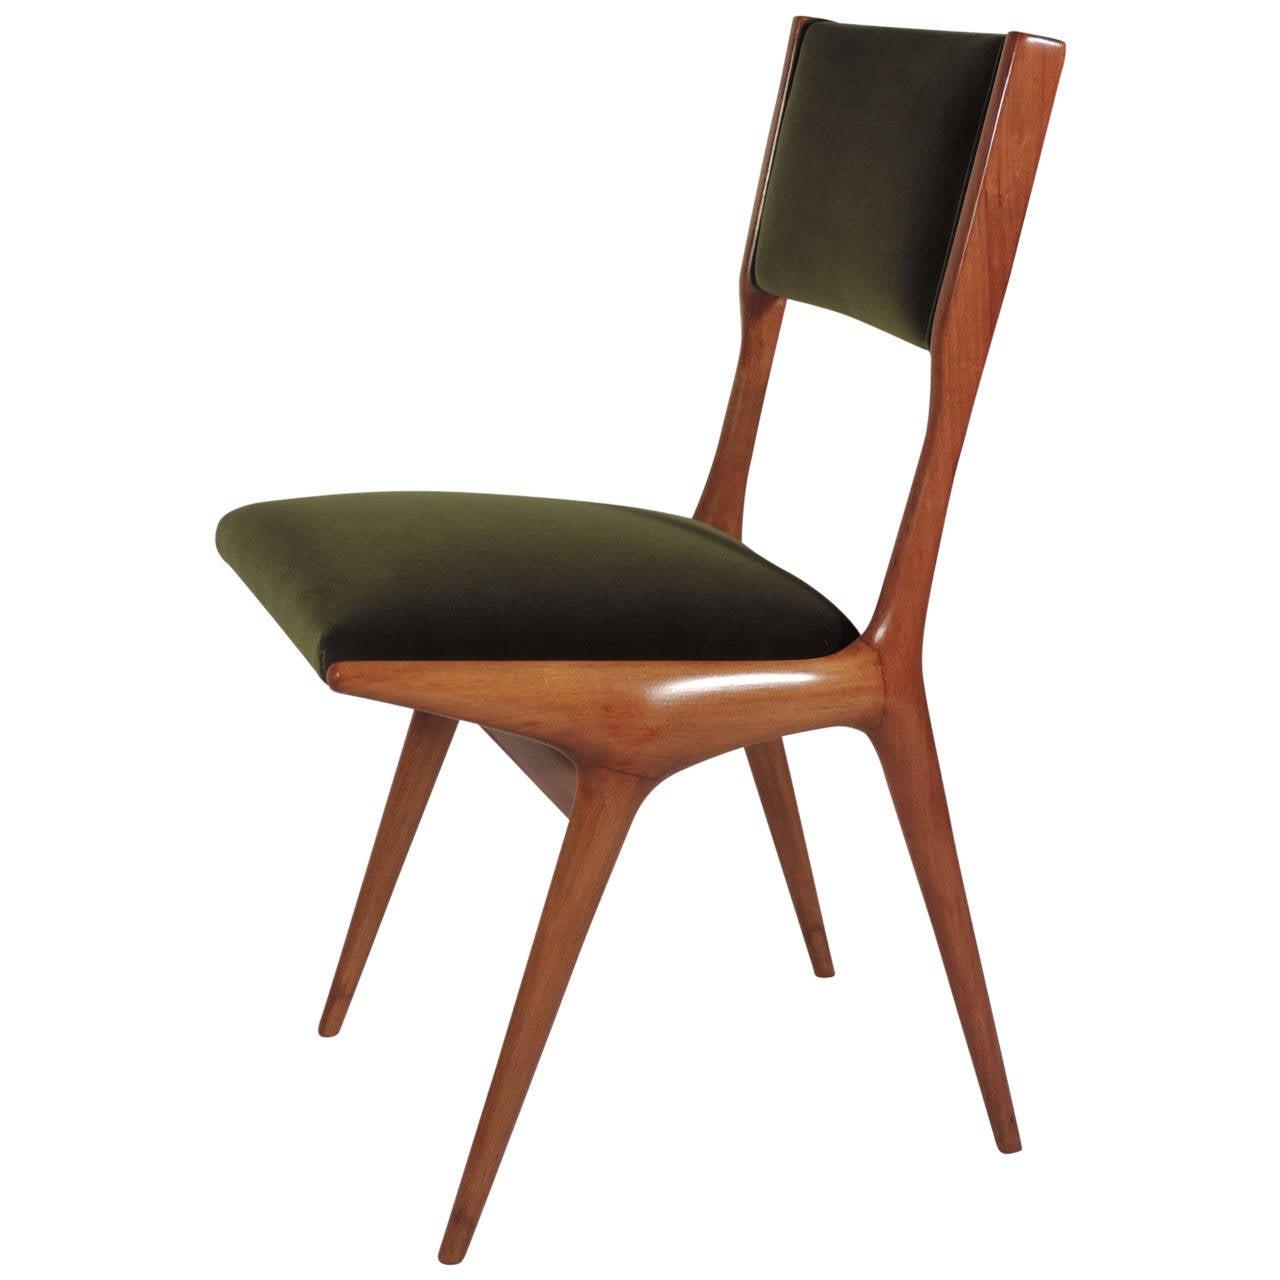 Splendid Carlo De Carli Chair For Cassina For Sale At 1stdibs